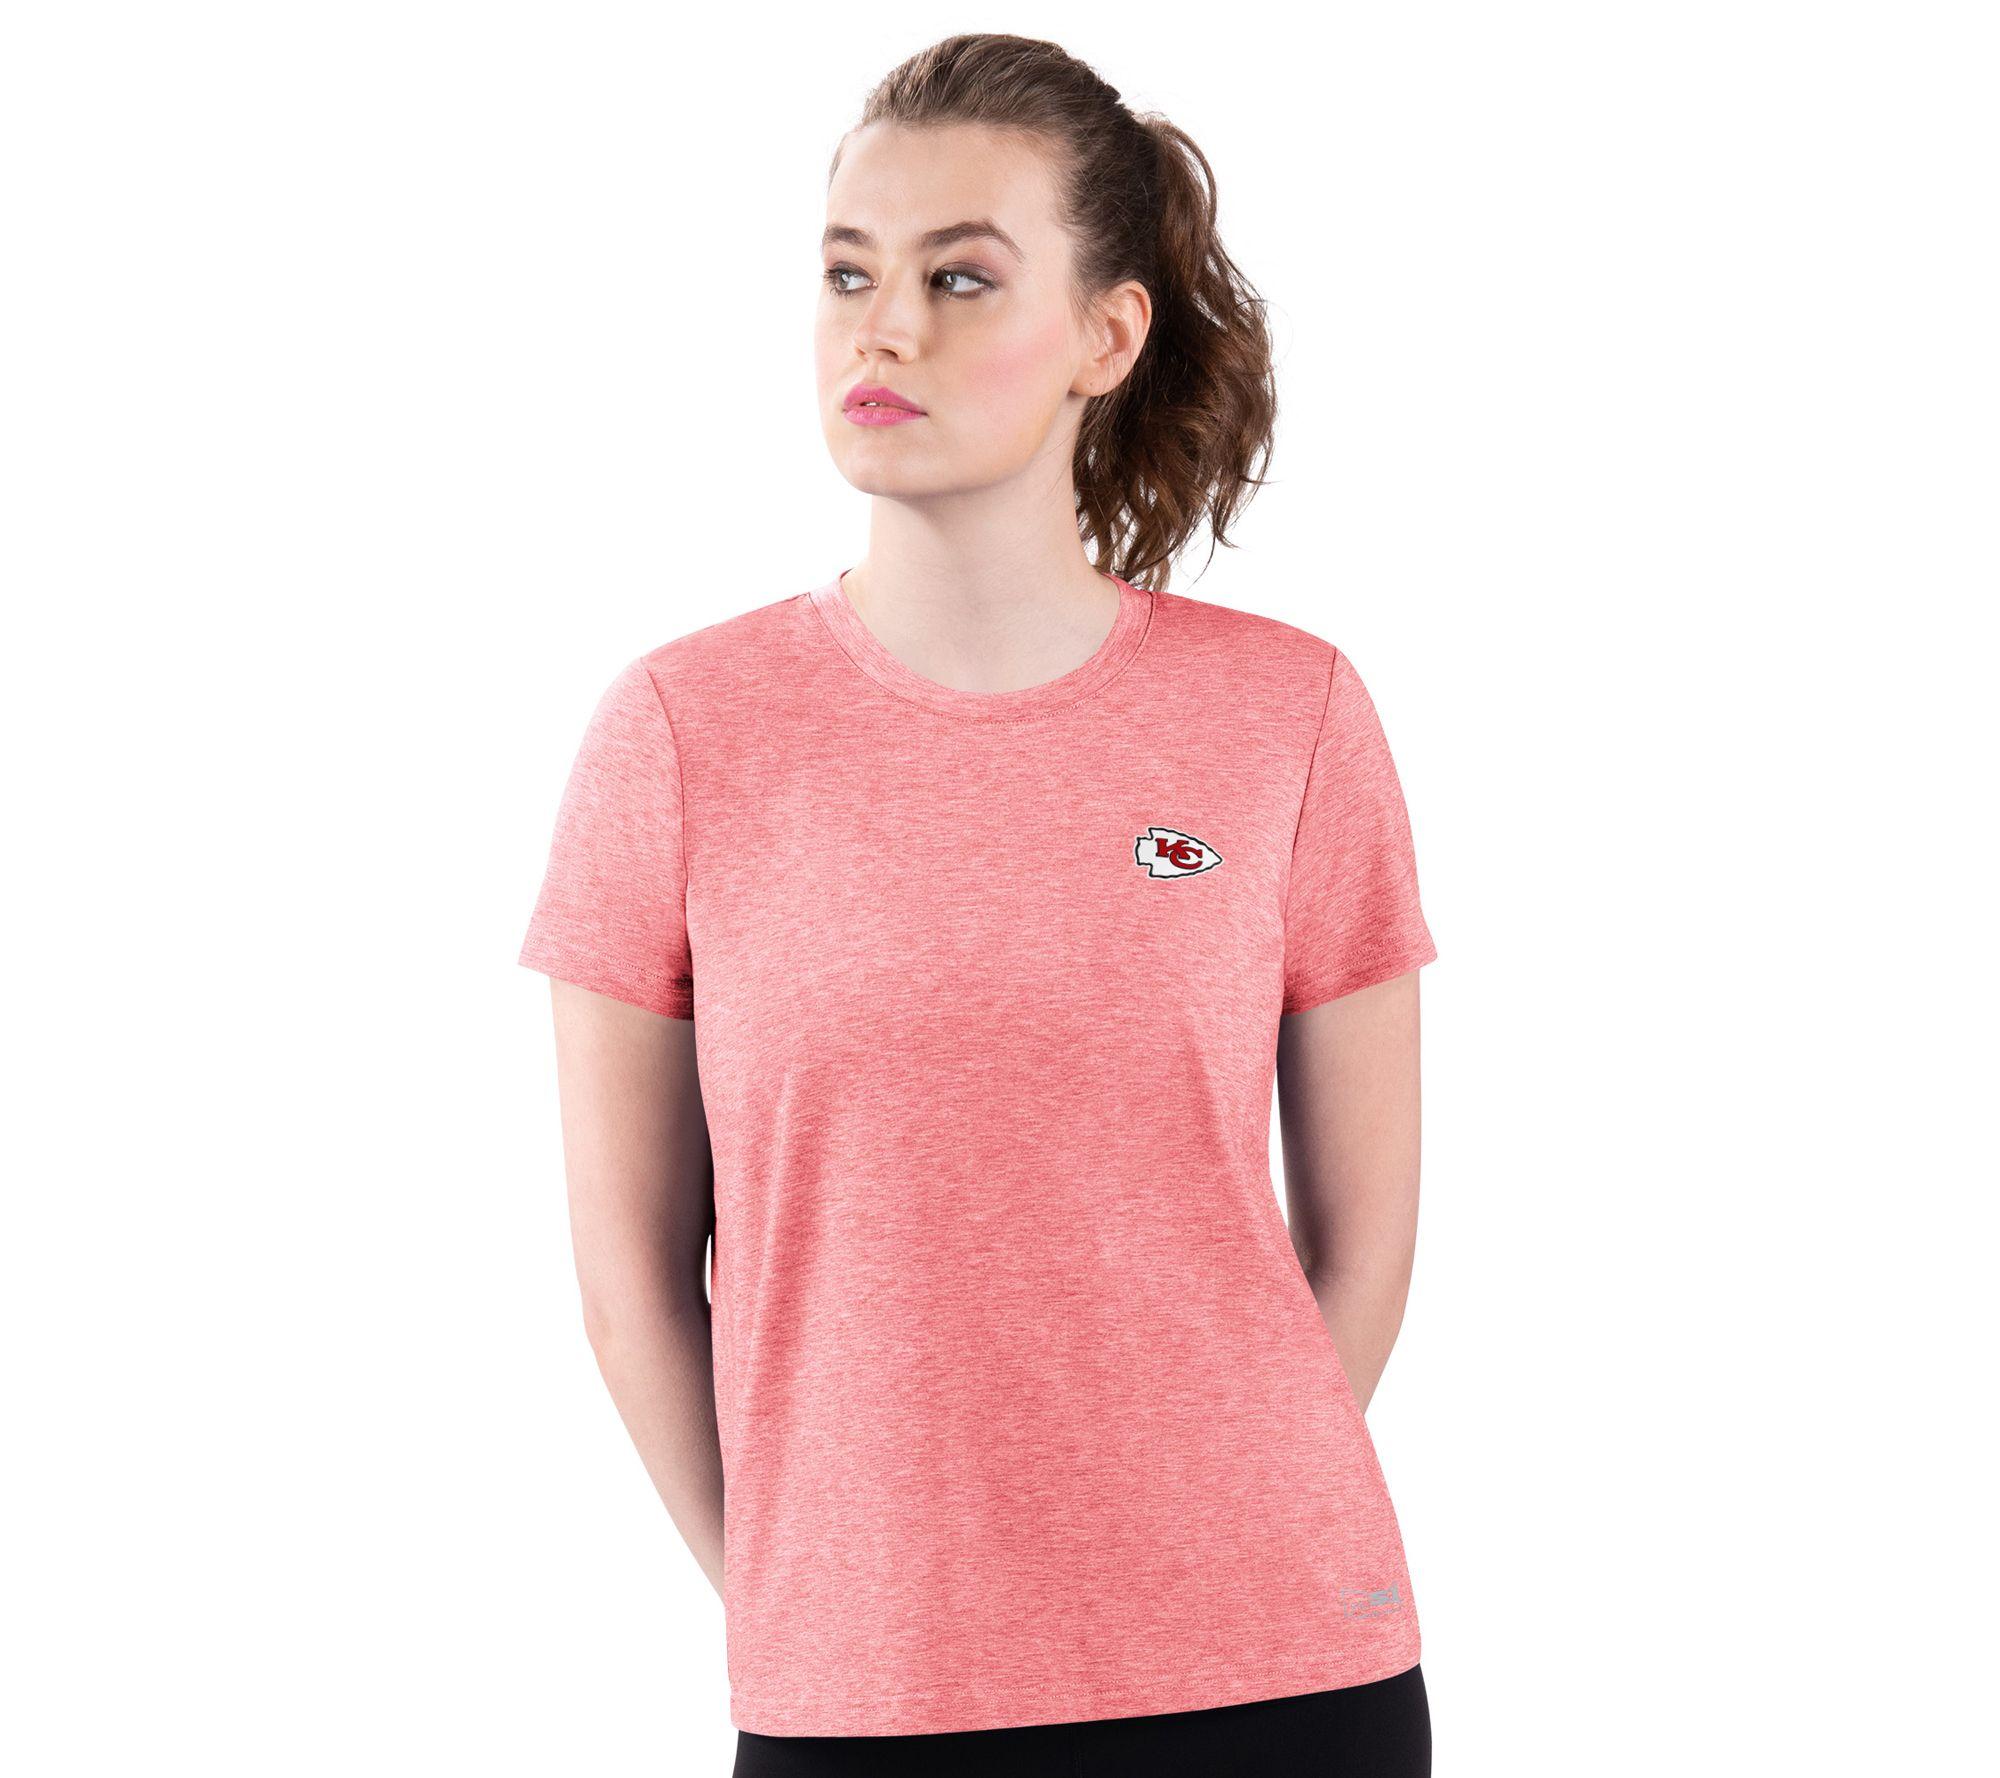 MSX by Michael Strahan for NFL Women's T-Shirt